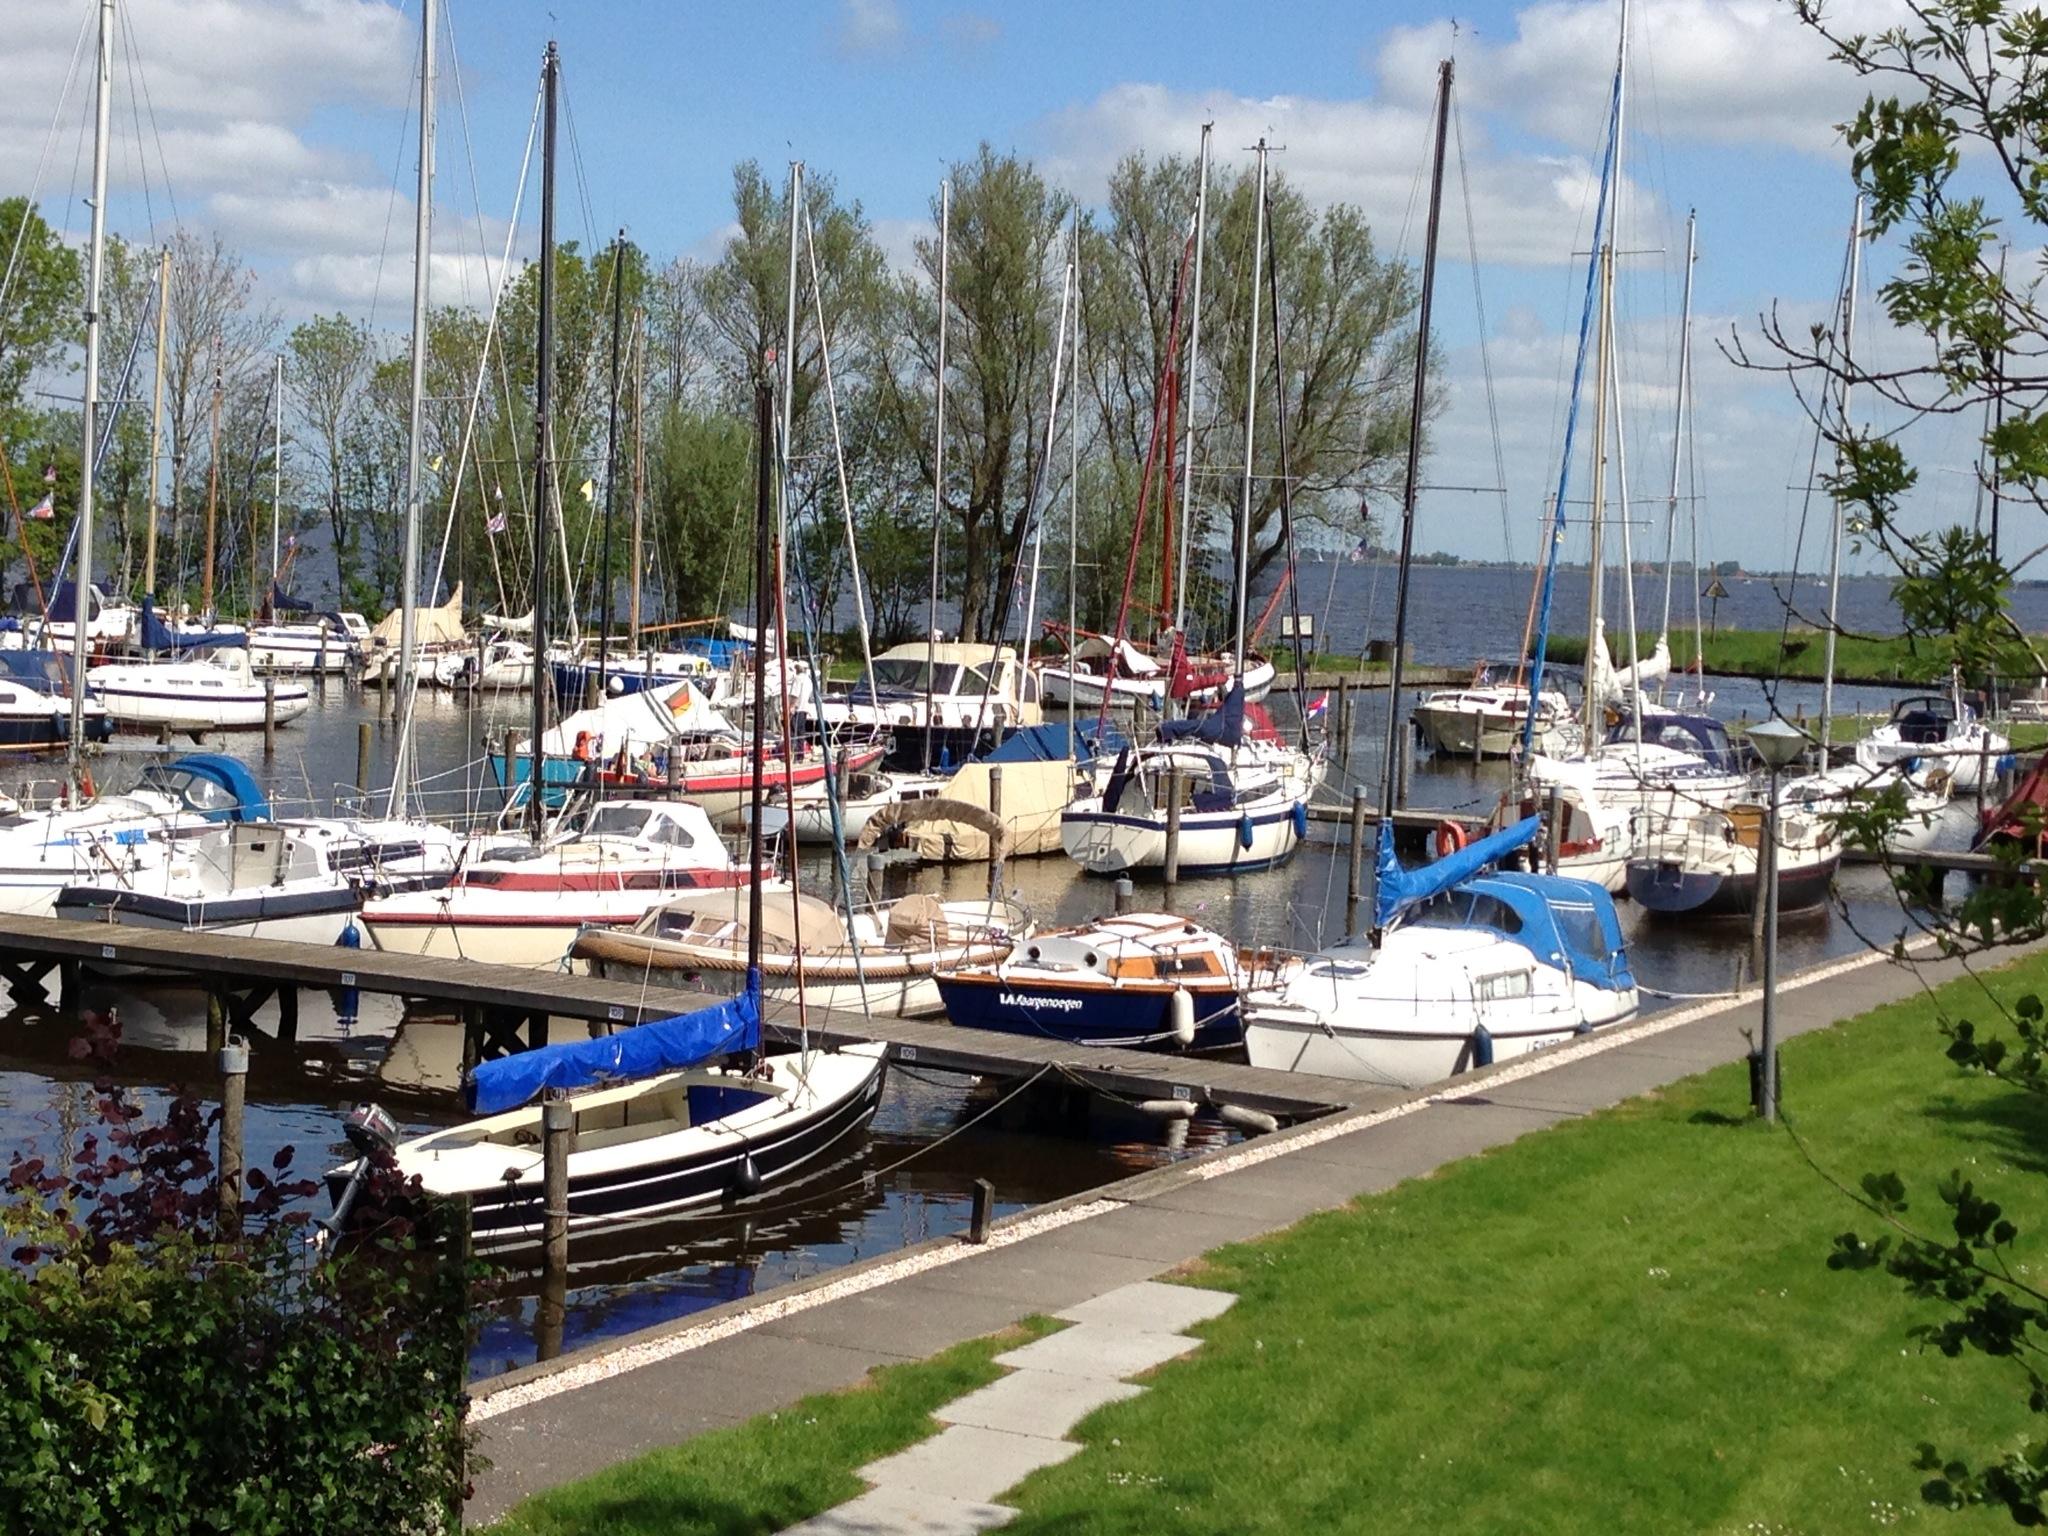 Jachthaven Elahuizen, Friesland